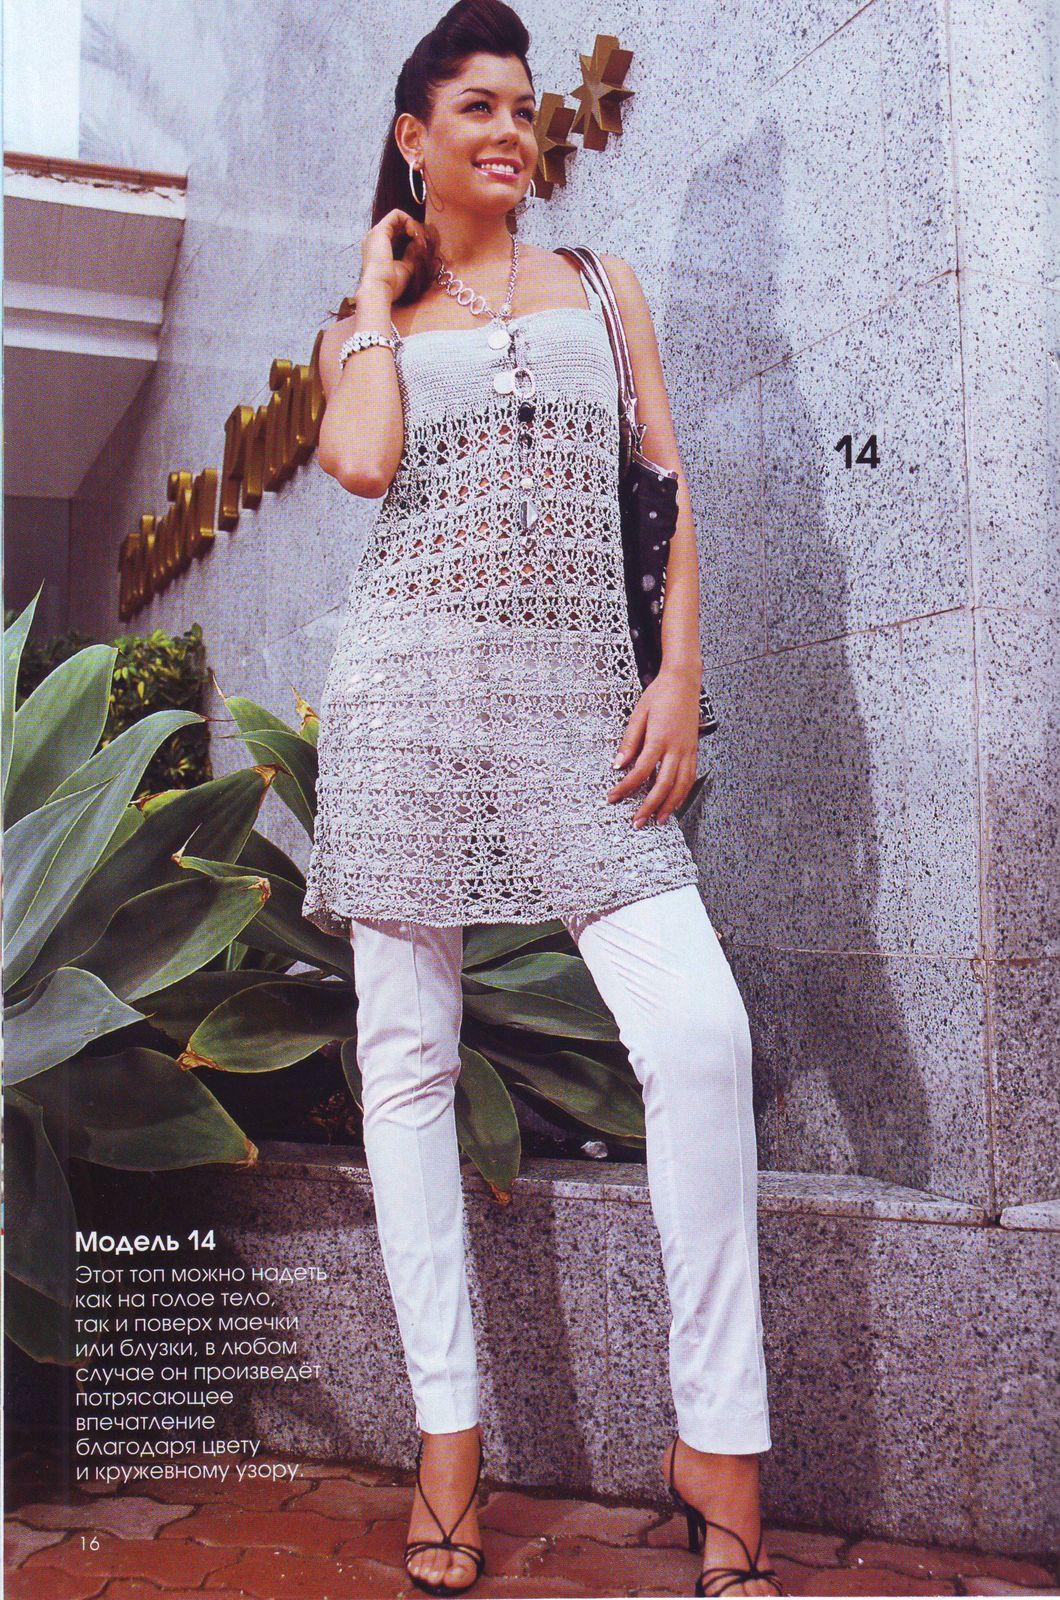 Блузка на голое тело в омске